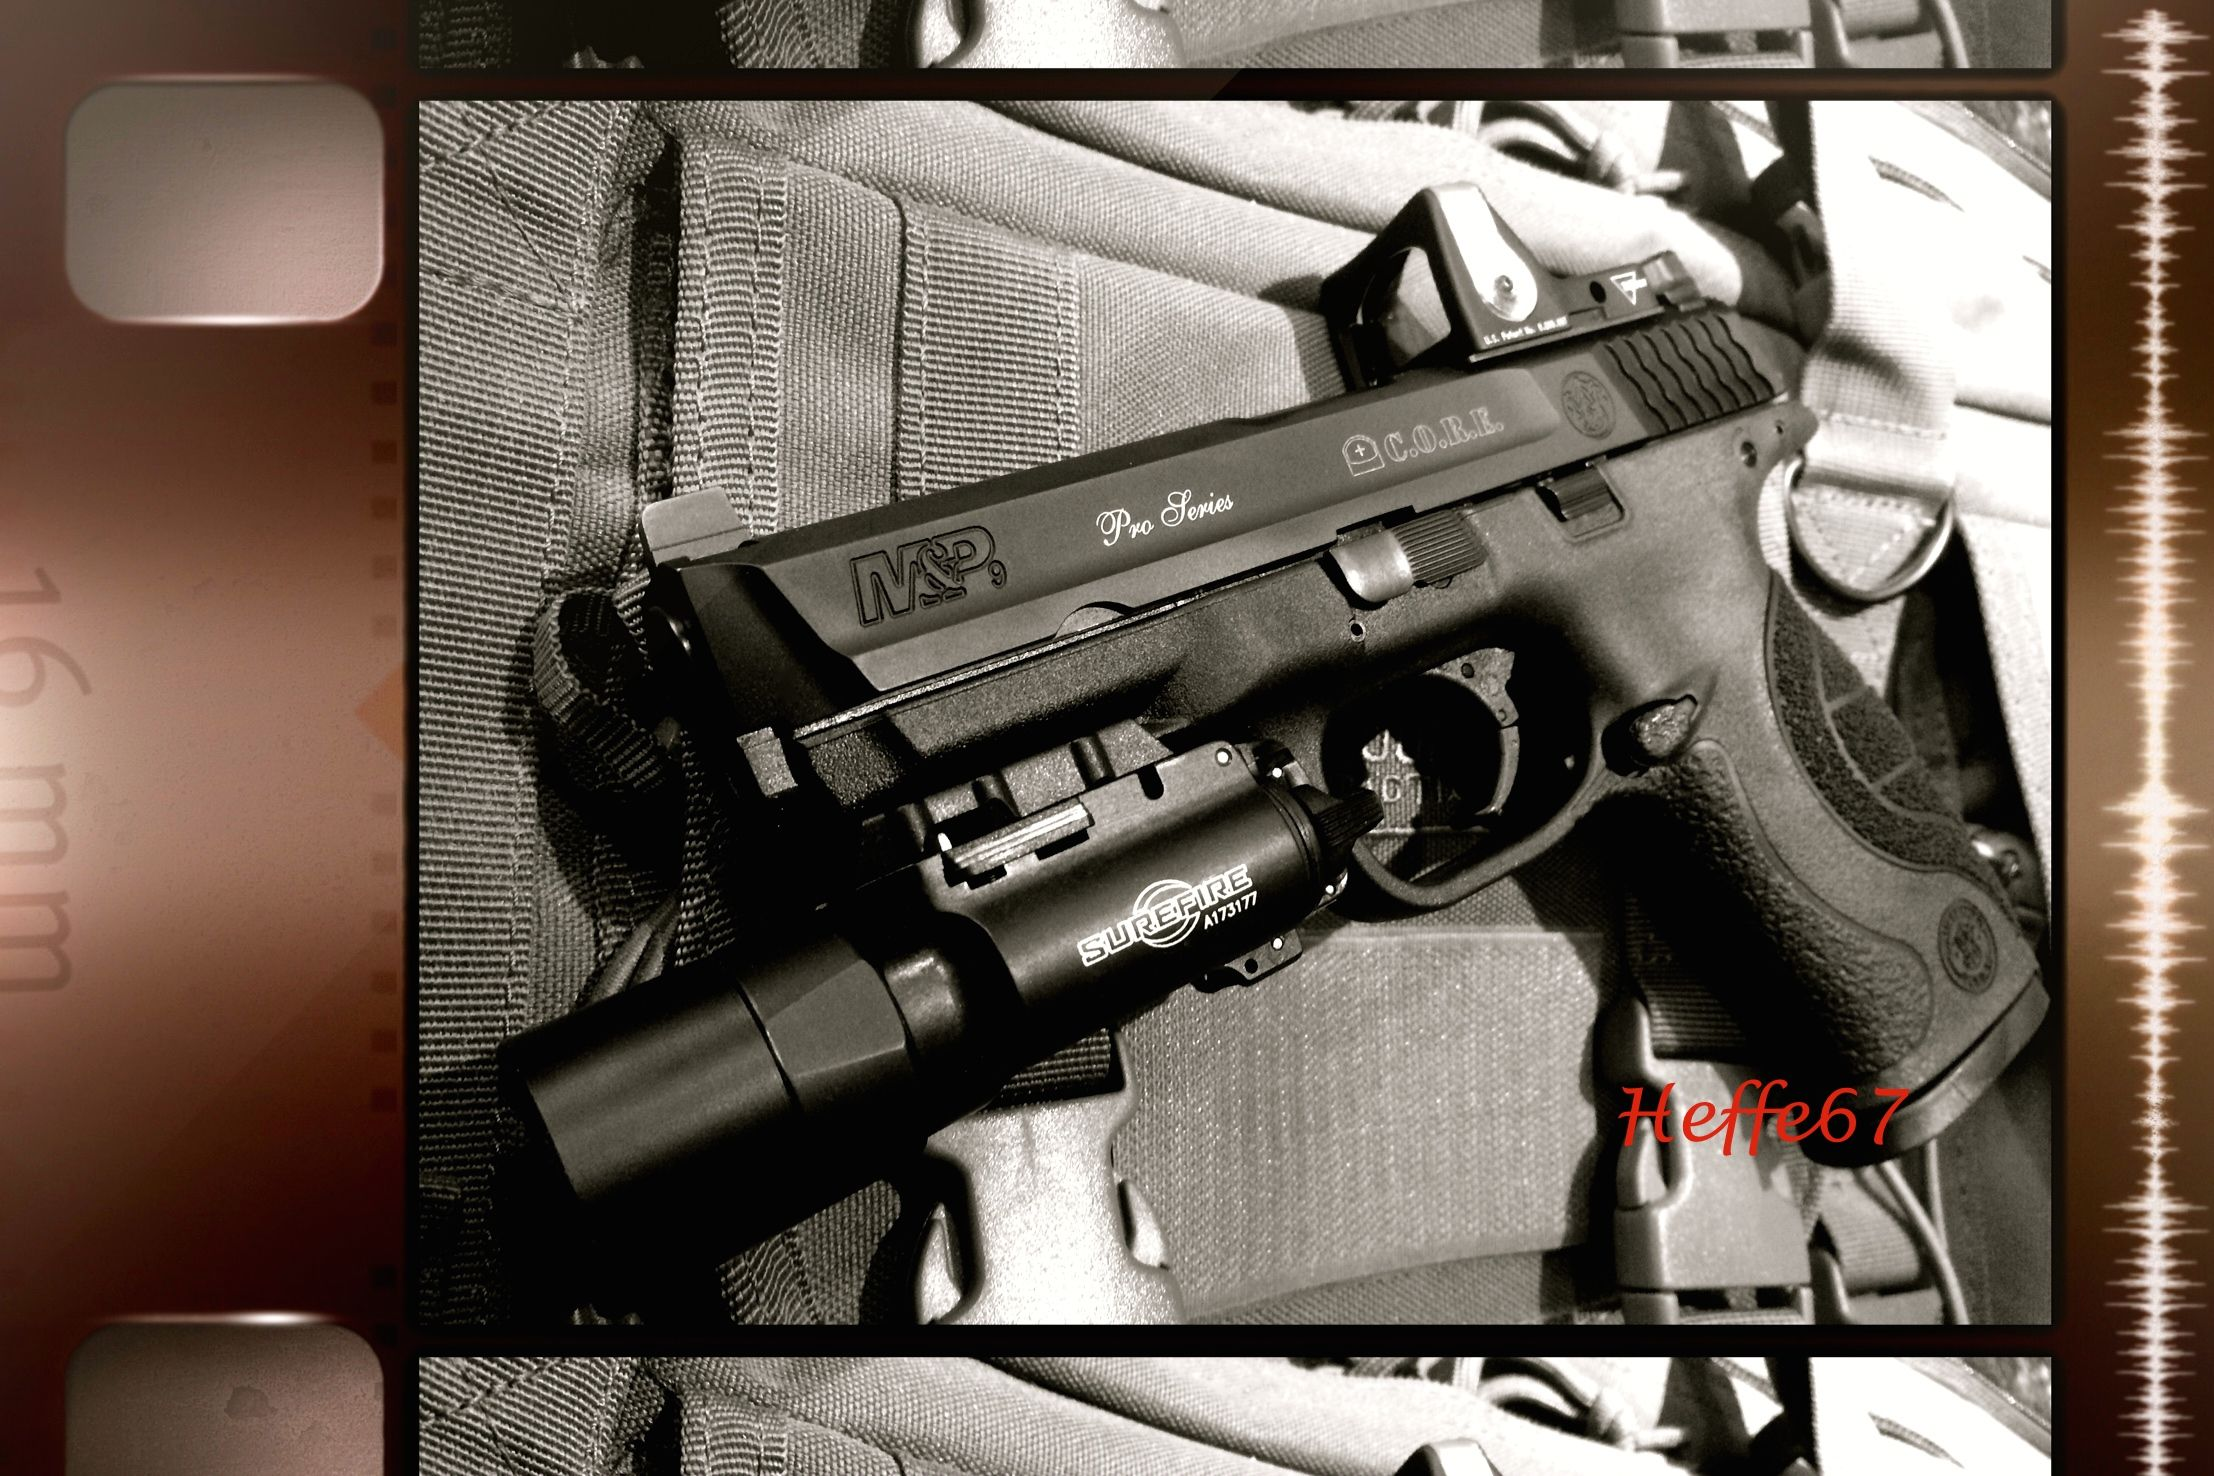 My Smith & Wesson M&P Pro C.O.R.E. with Surefire X300 and Trijicon RMR